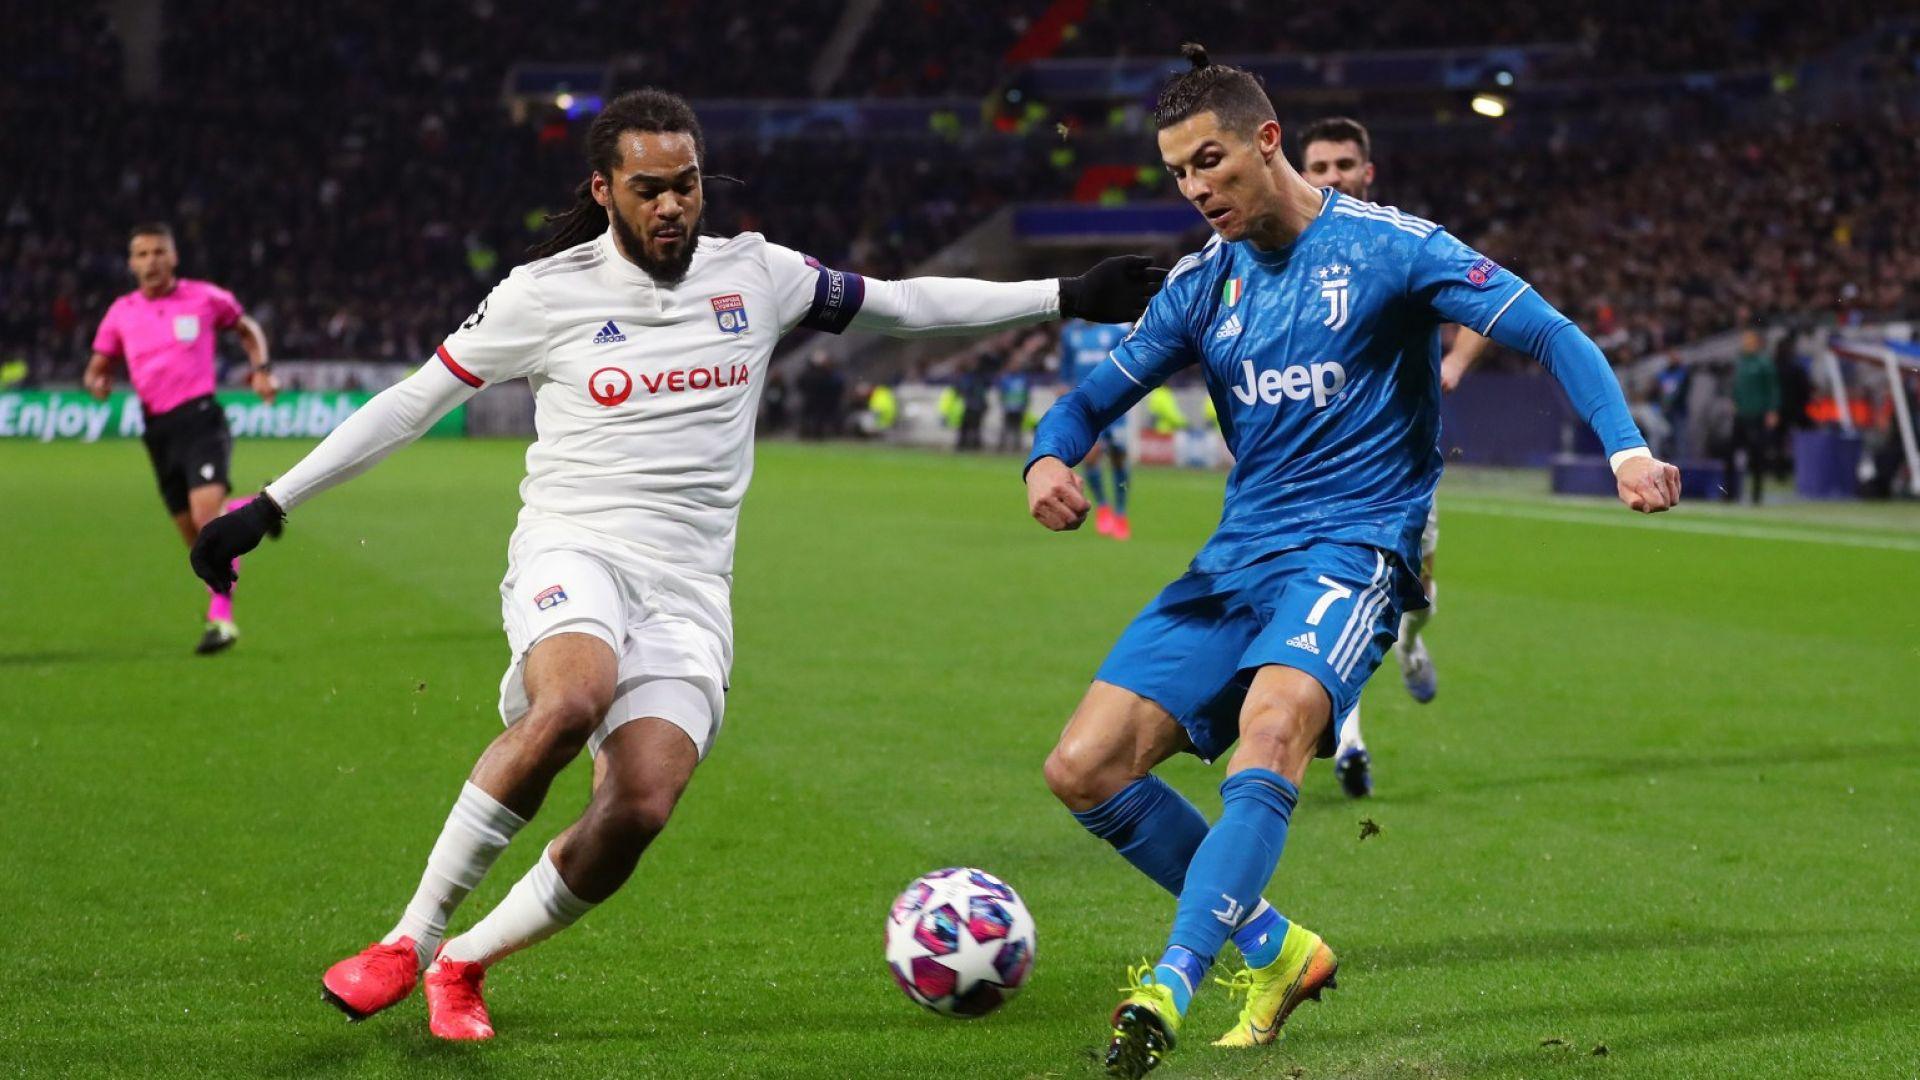 Ювентус пожела да играе европейския си осминафинал в Малта